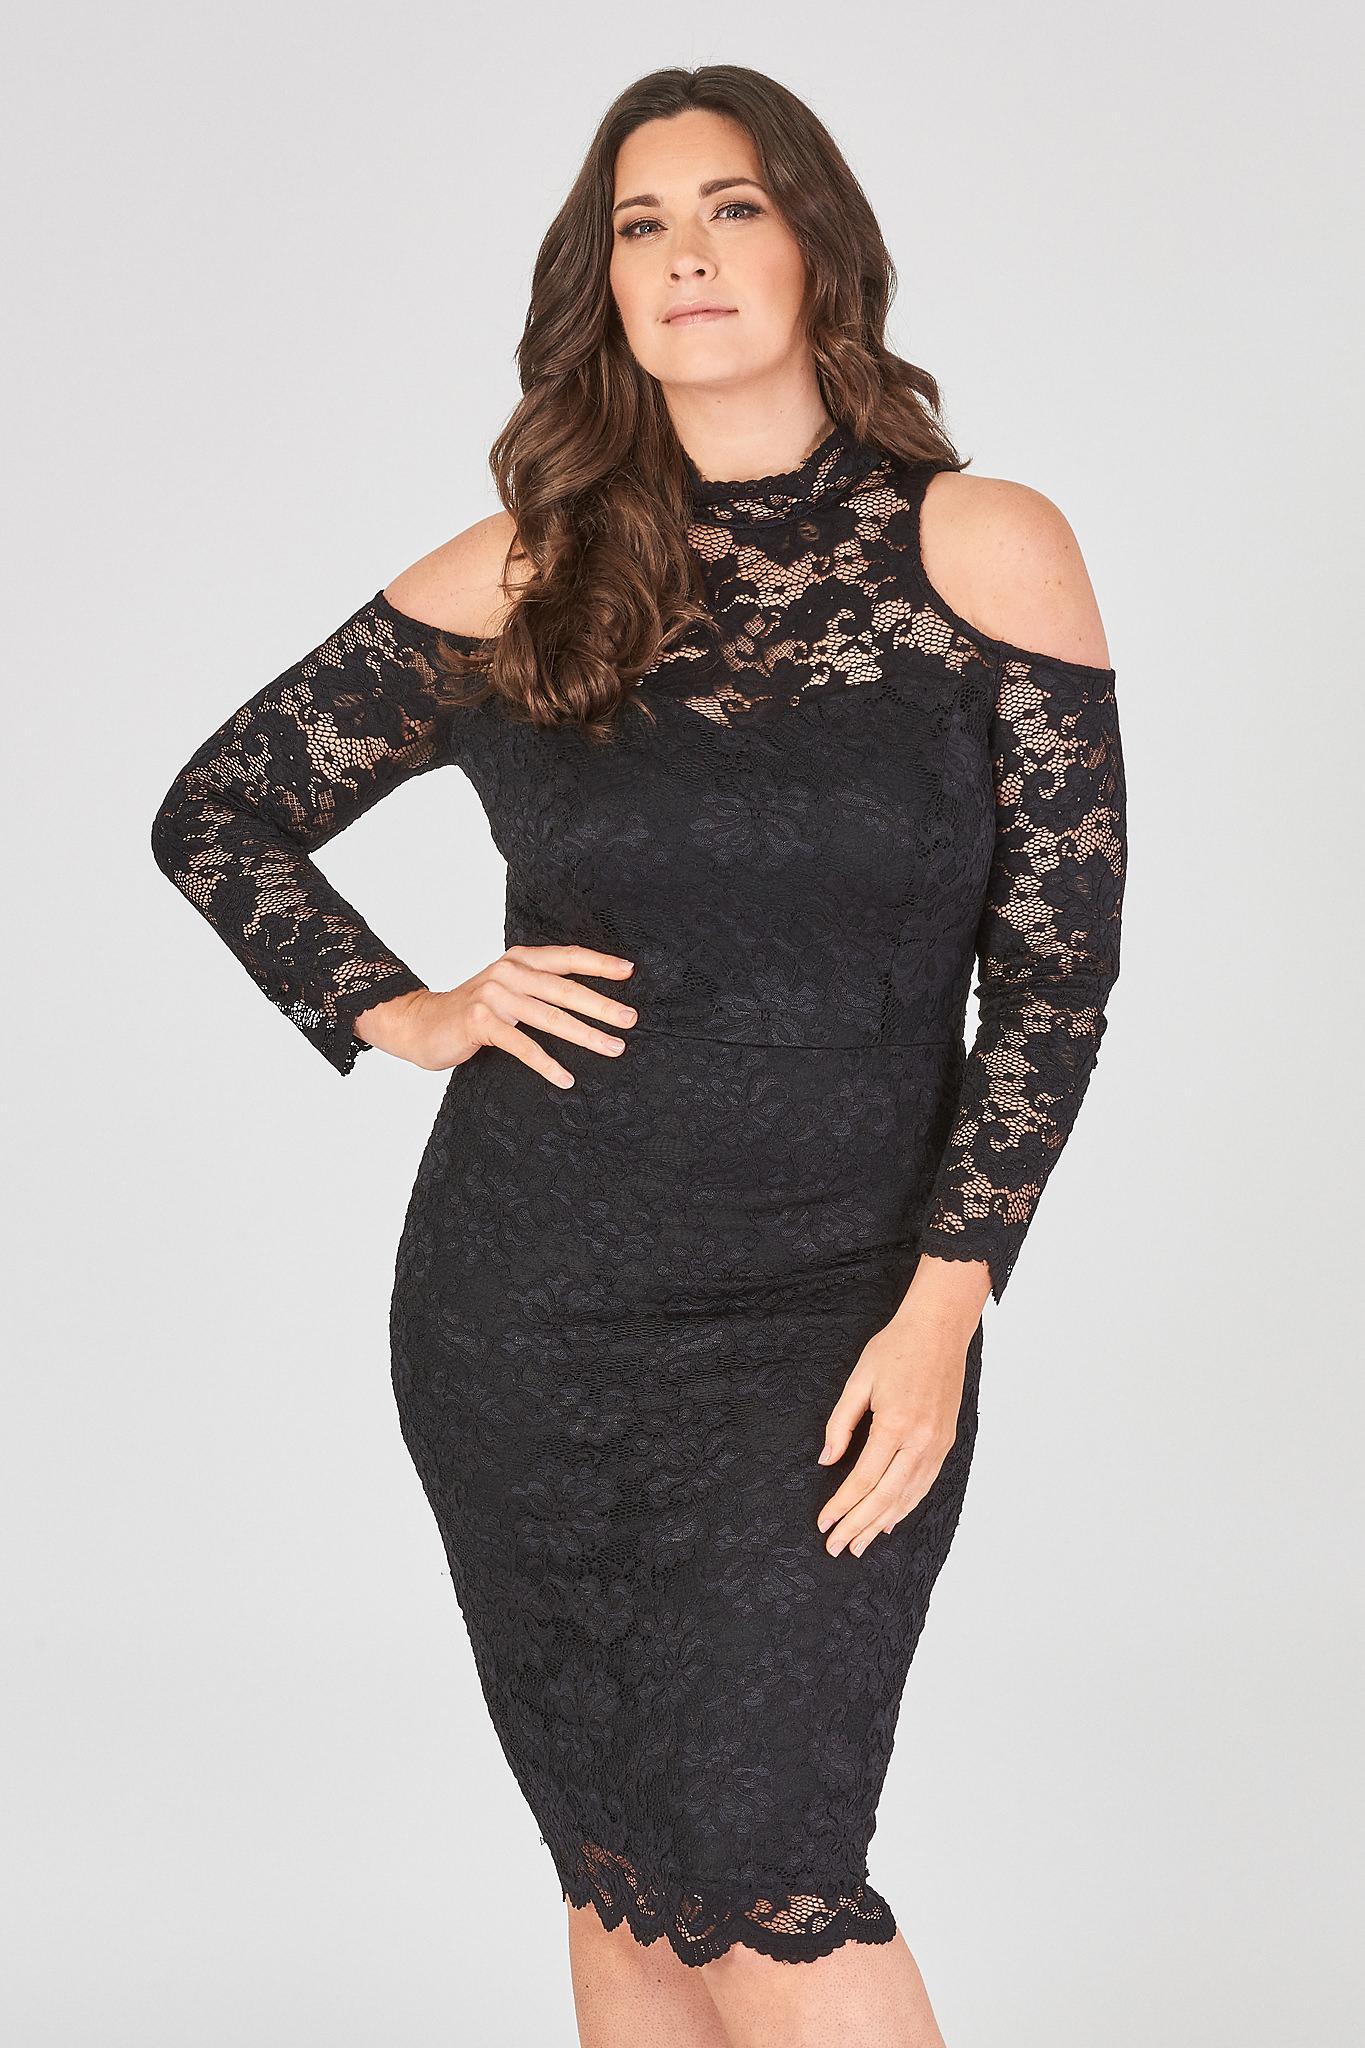 Črna čipkasta elegantna obleka.